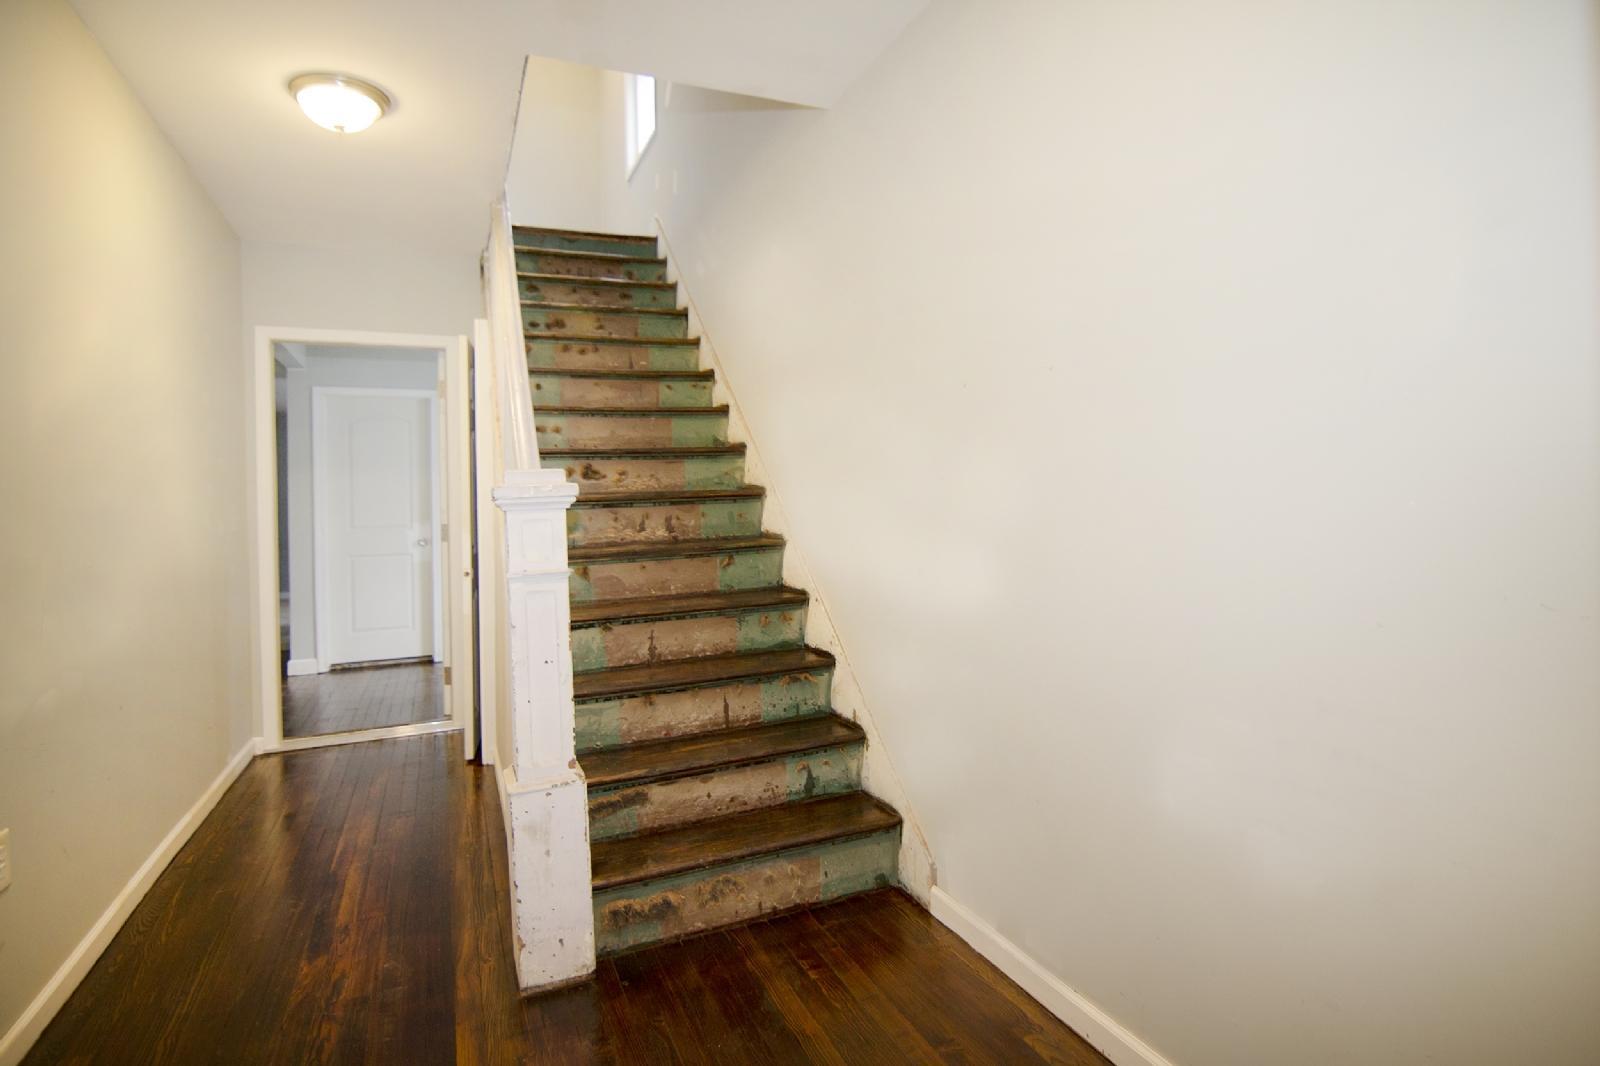 156 Crystal St, North Arlington, NJ 07031 - Estimate and Home ...